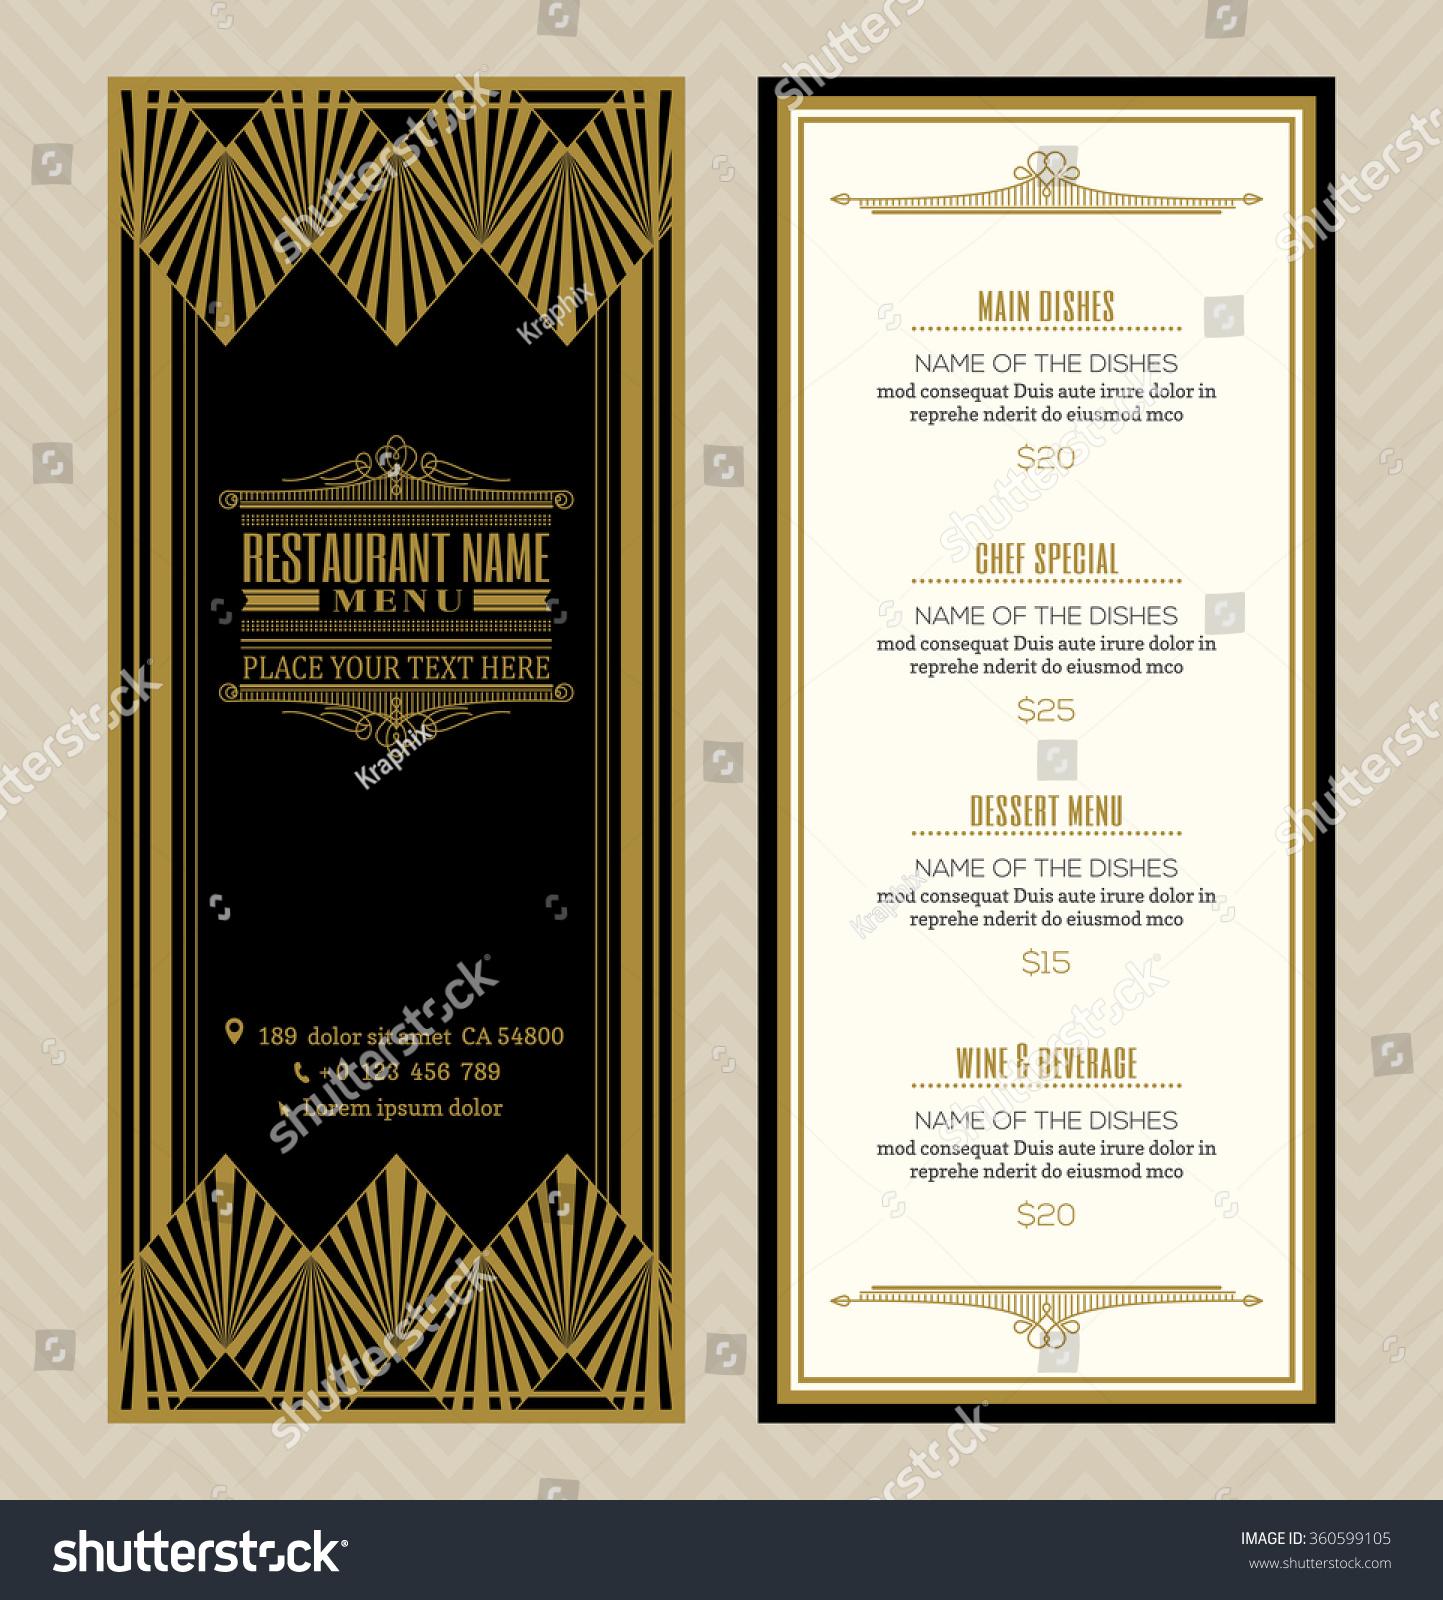 Restaurant cafe menu vector design template stock vector for Artistic cuisine menu